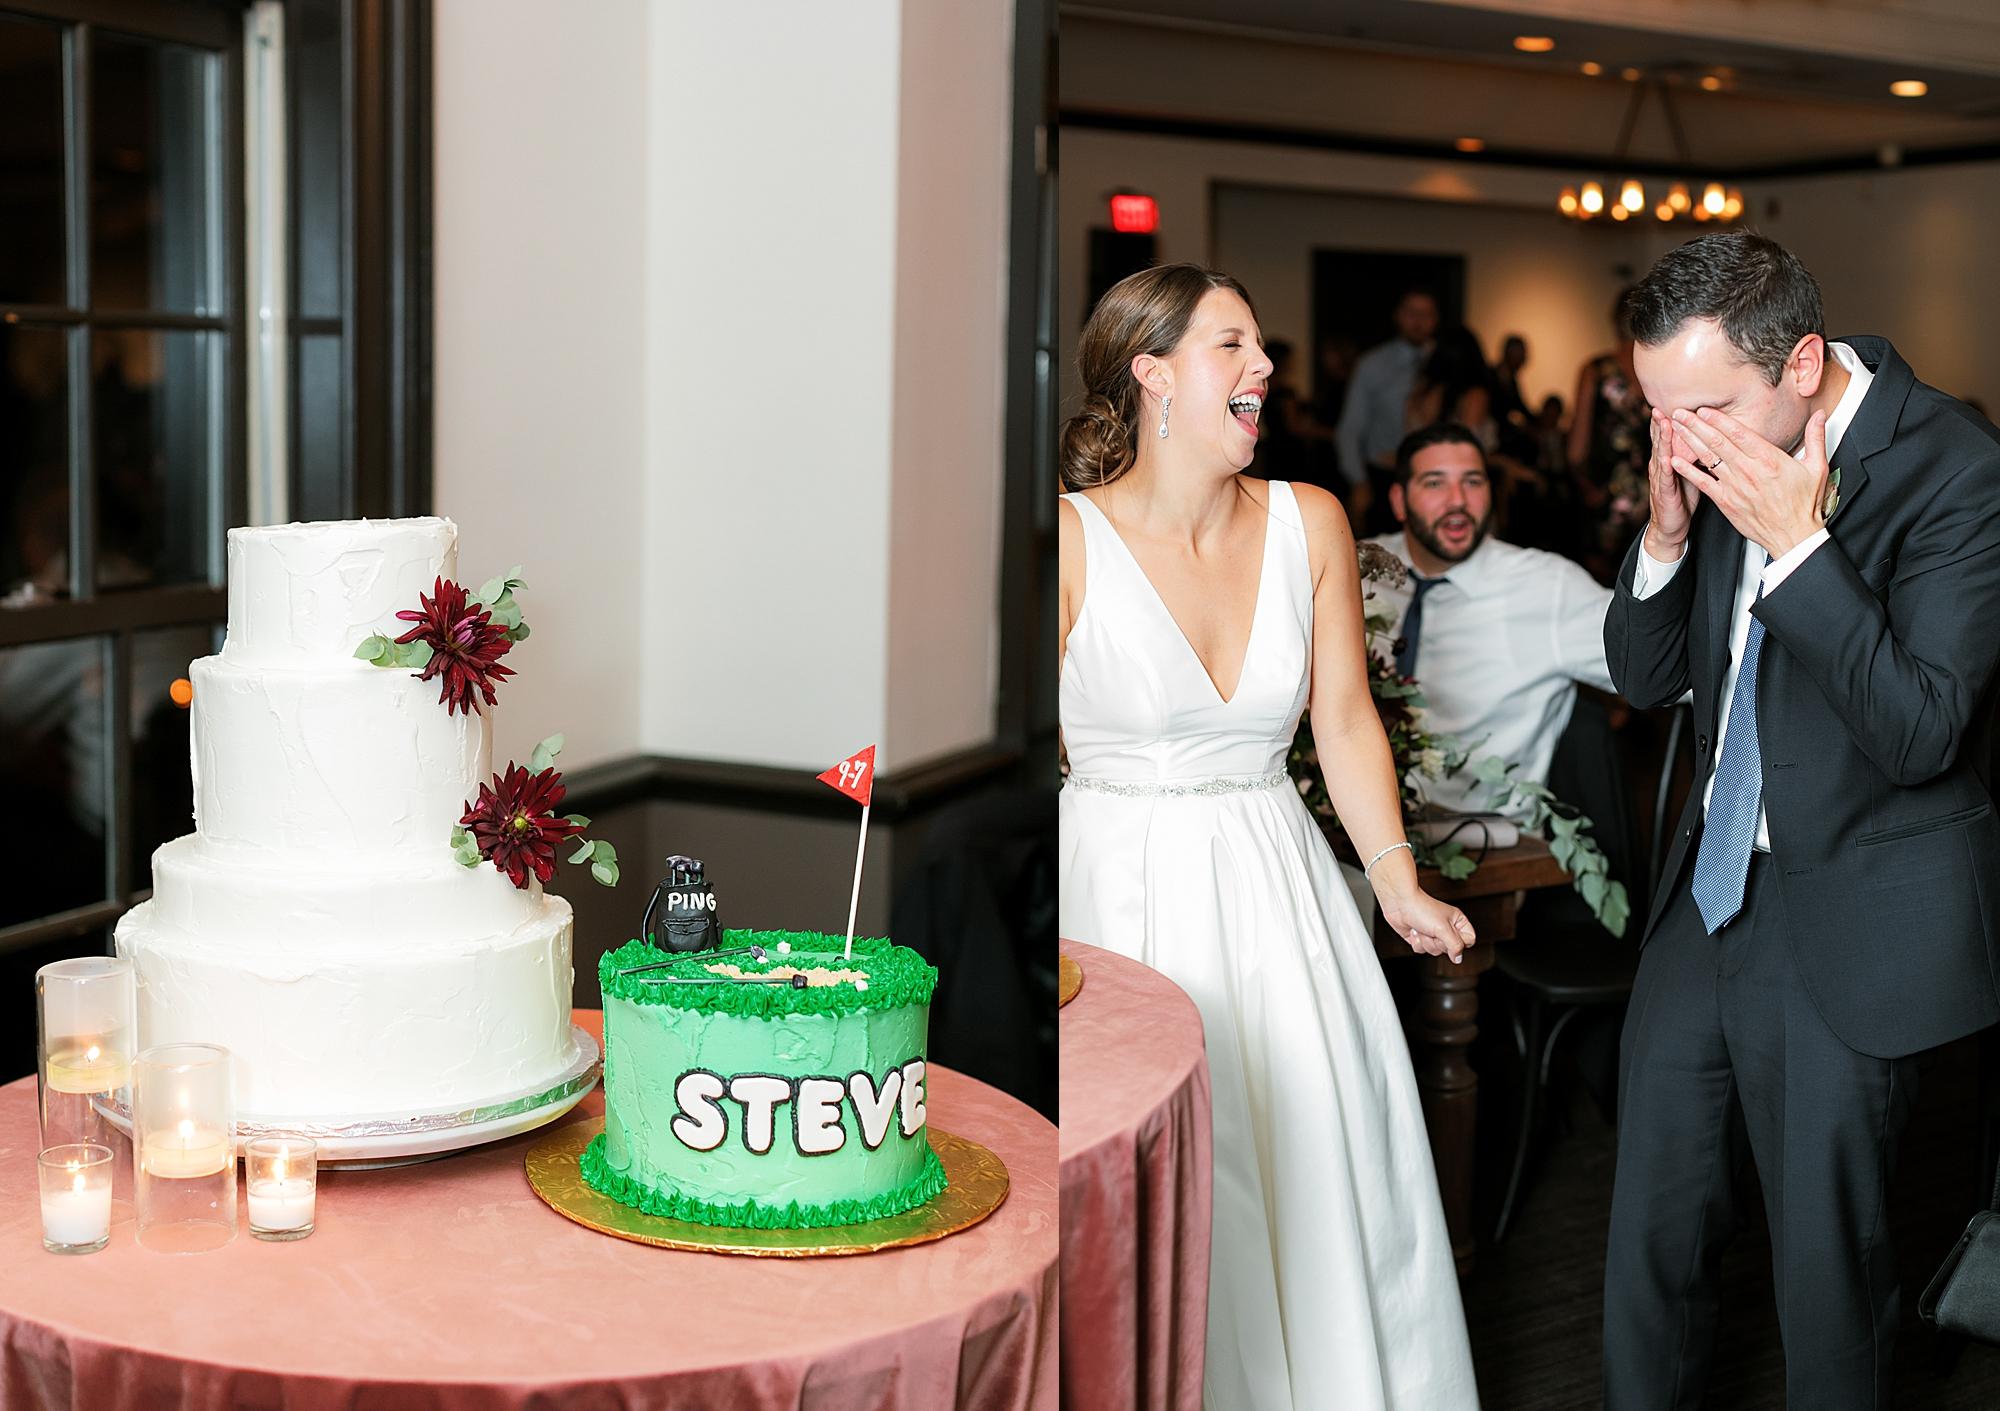 Princeton New Jersey Film Wedding Photographer Princeton University Wedding Photography by Magdalena Studios NJ Wedding Photographer65